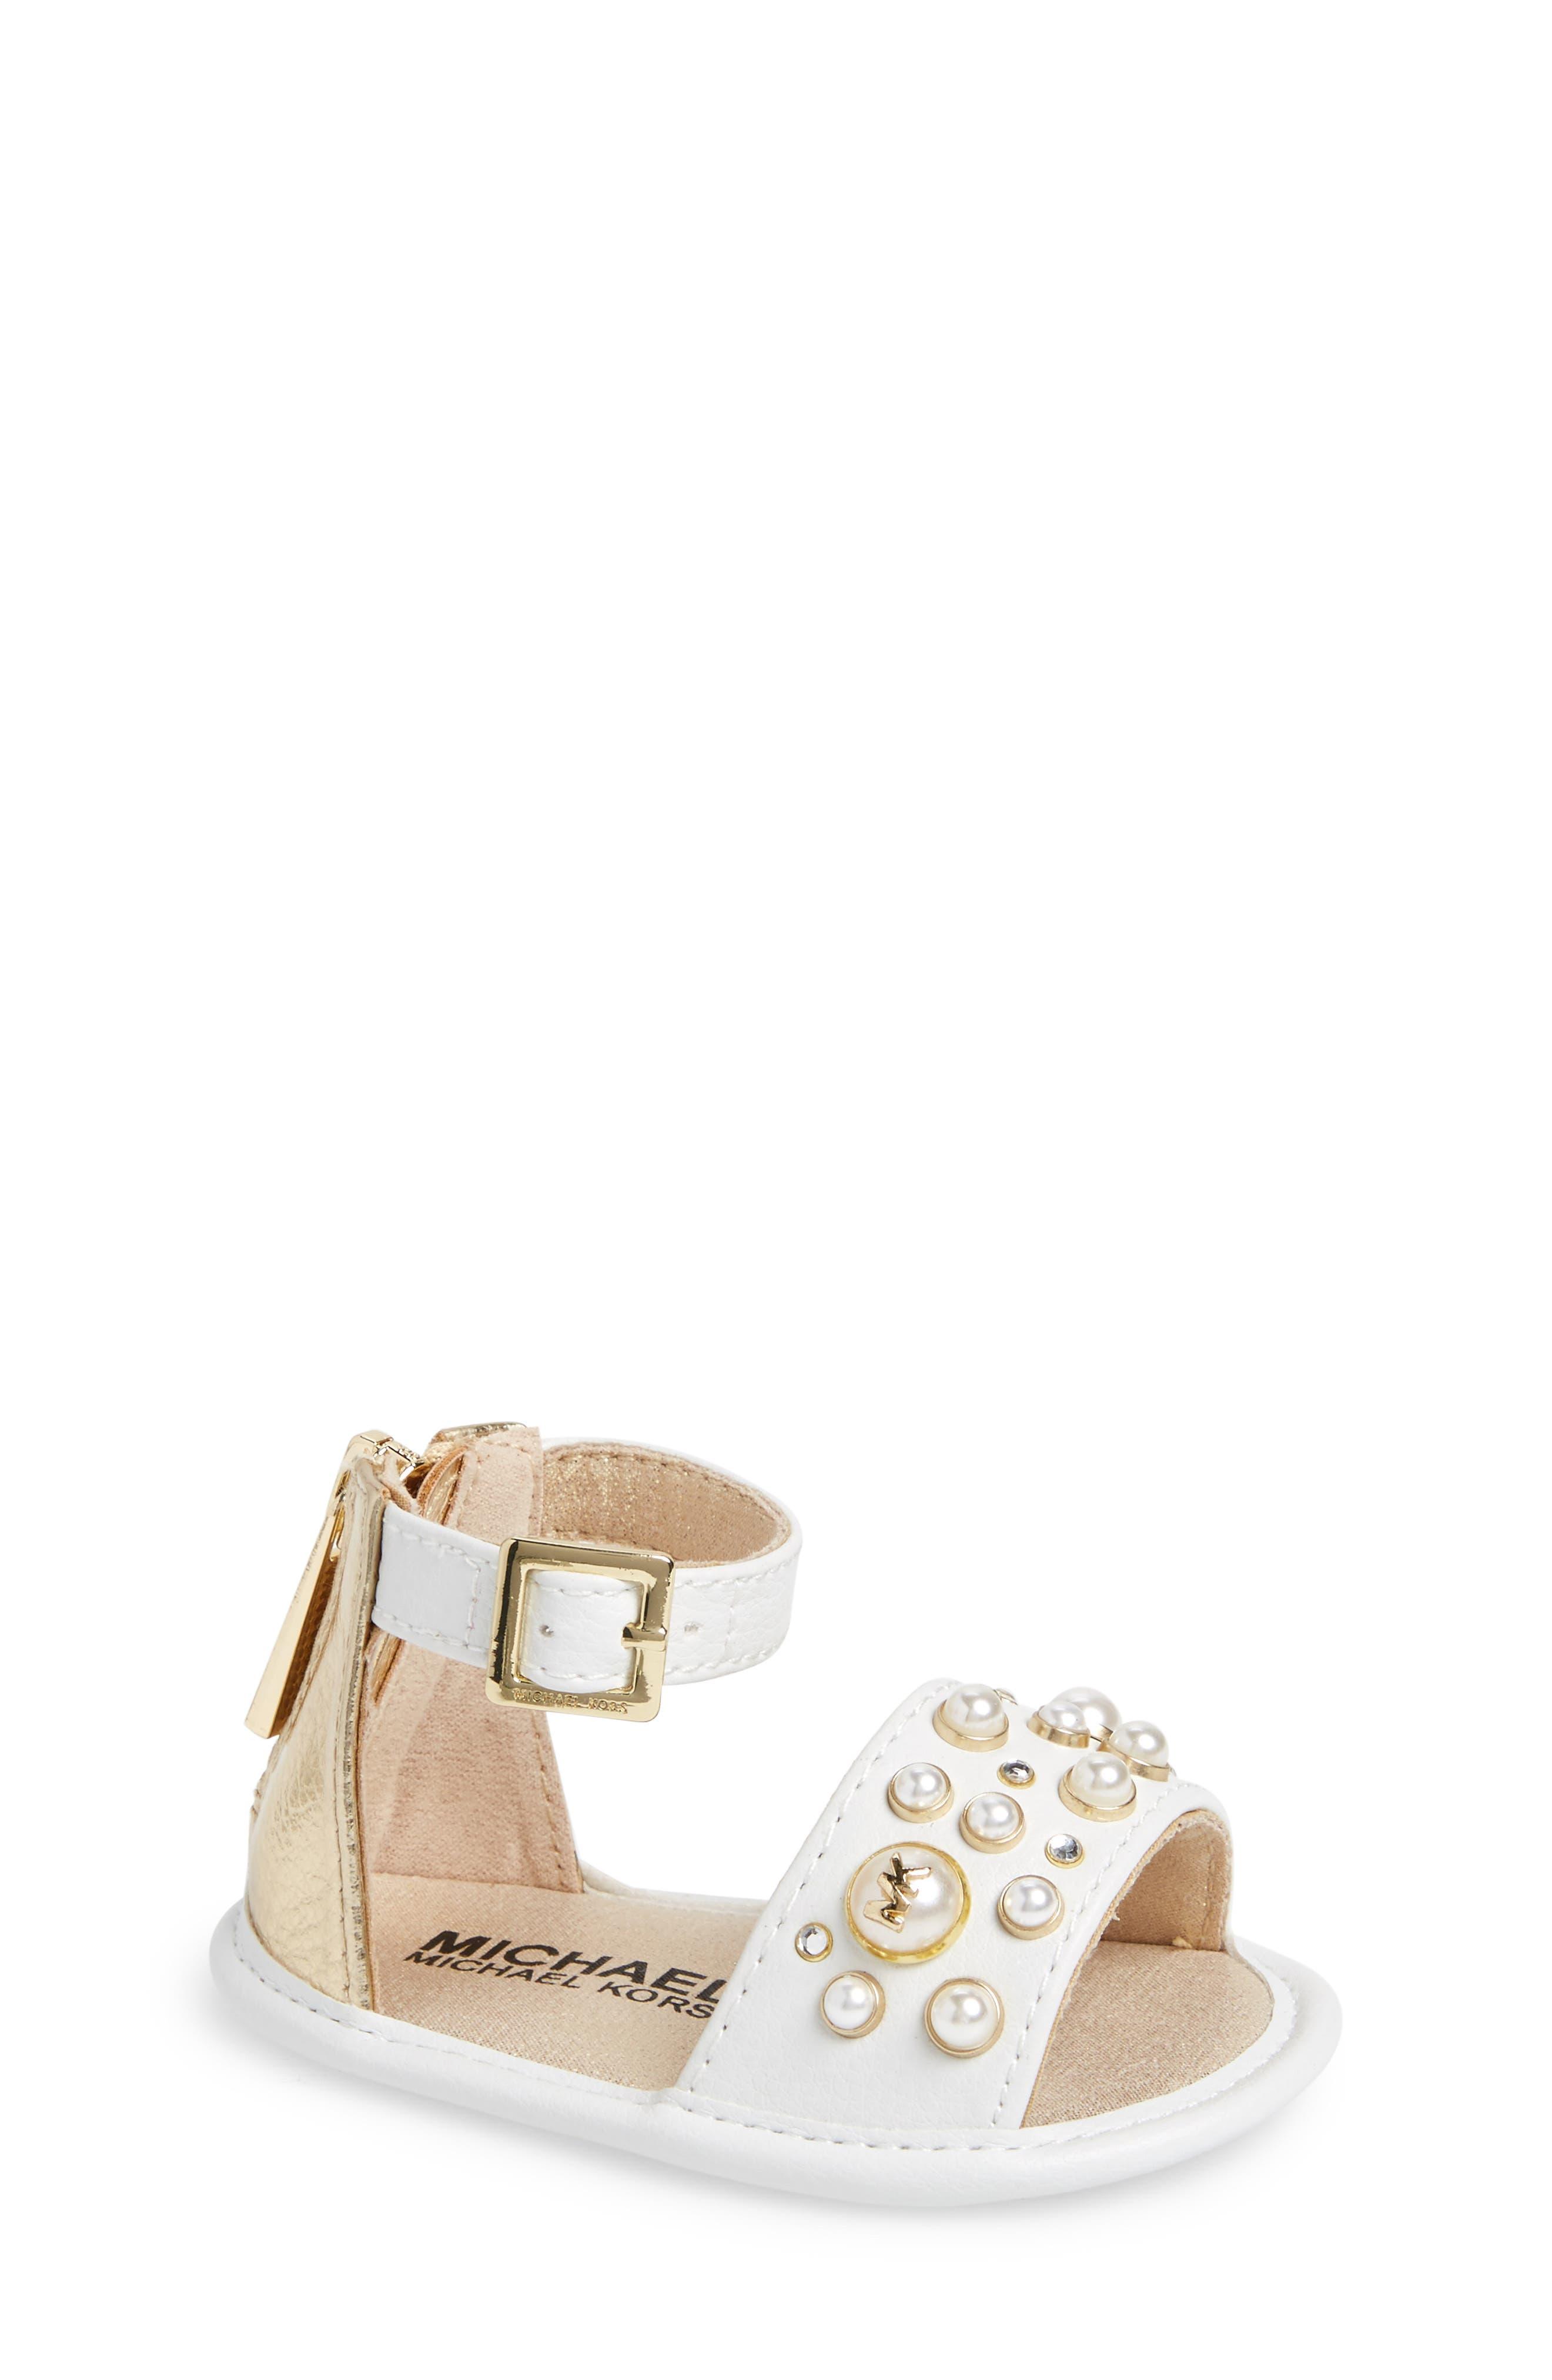 Pennie Sandal,                         Main,                         color, White